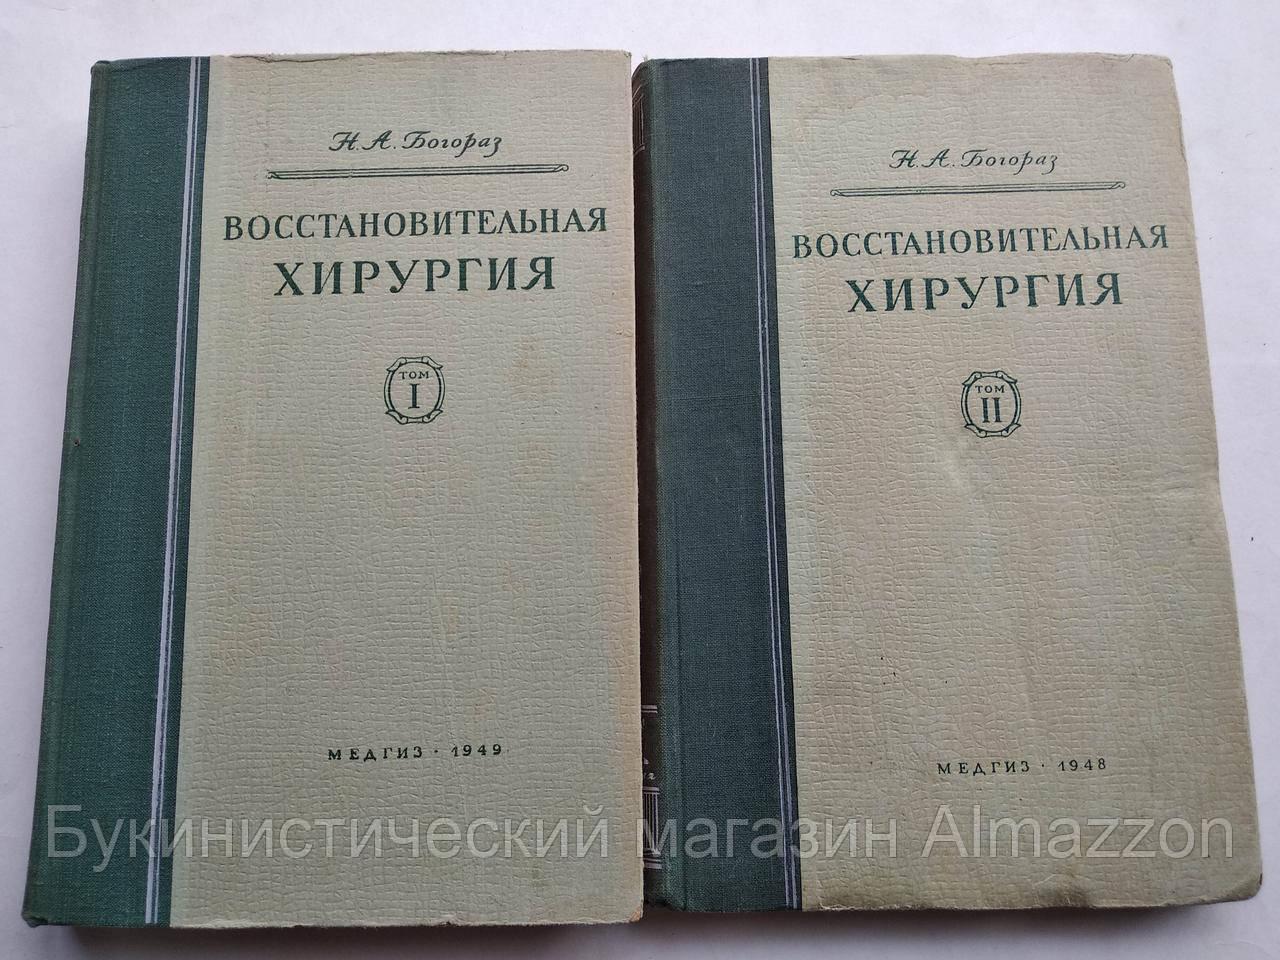 Восстановительная хирургия 2 тома. Н.А.Богораз. Медгиз. 1948год. 1949 год